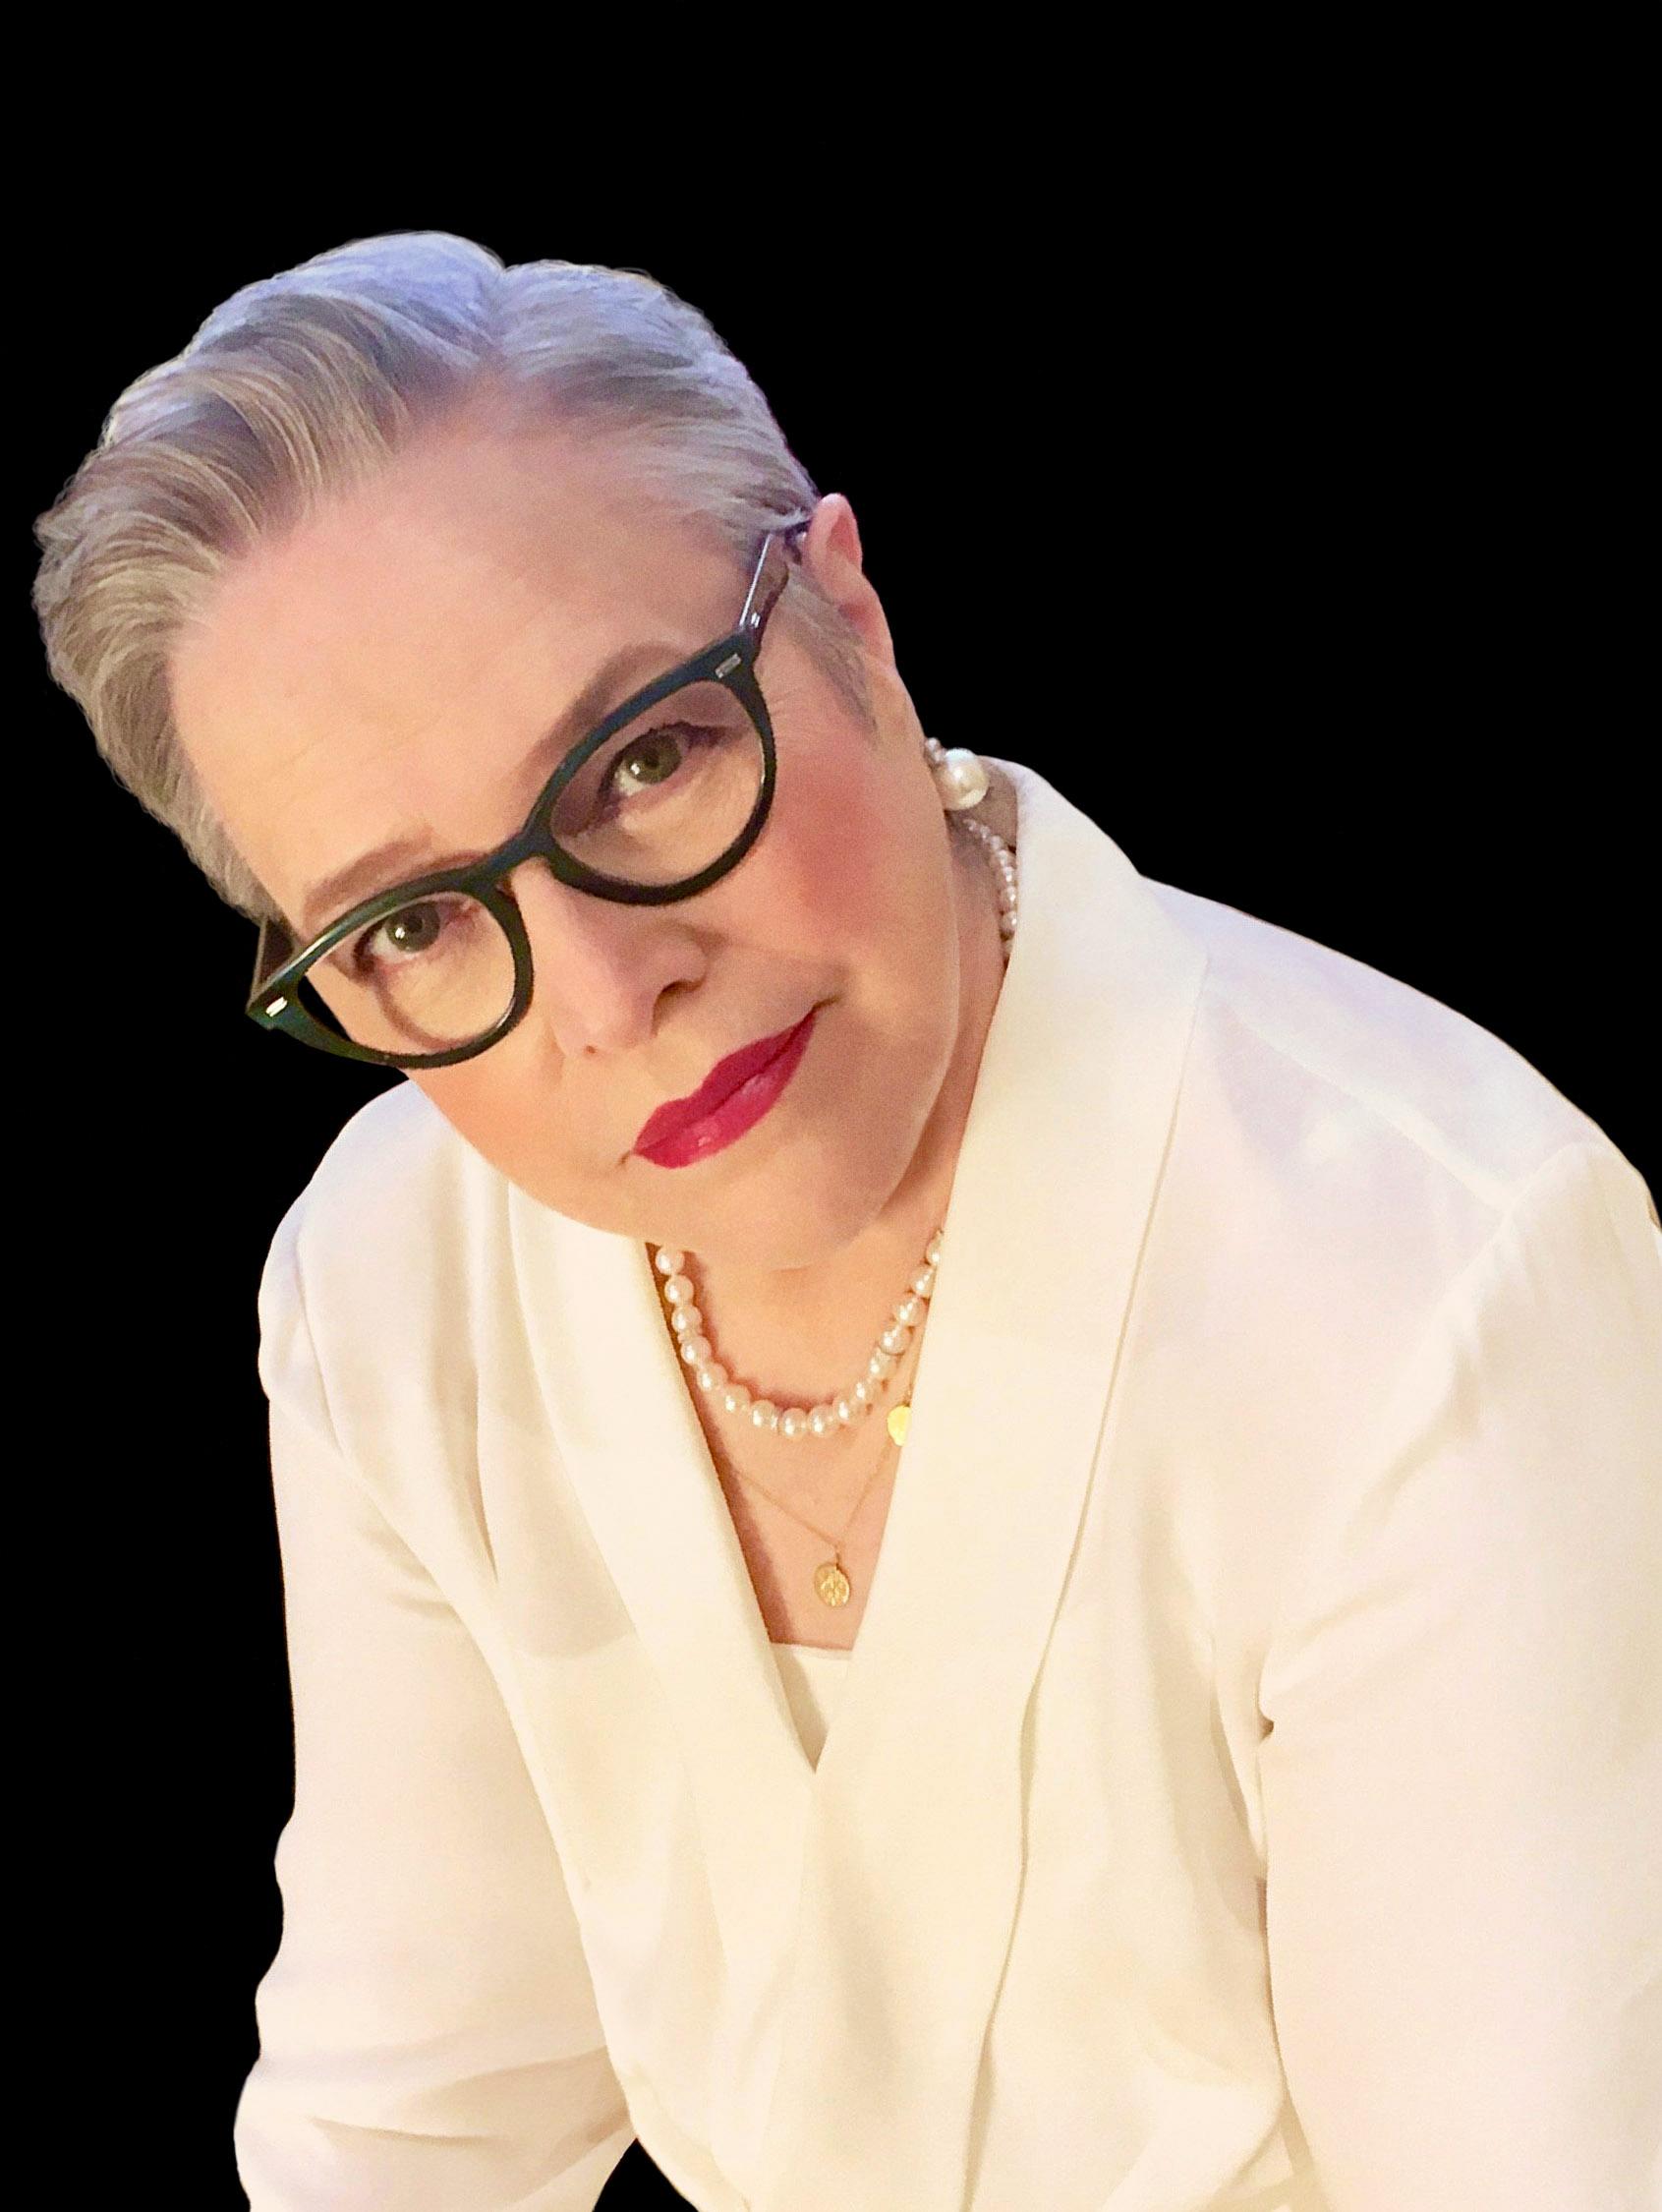 Kathy Bates - IMDb